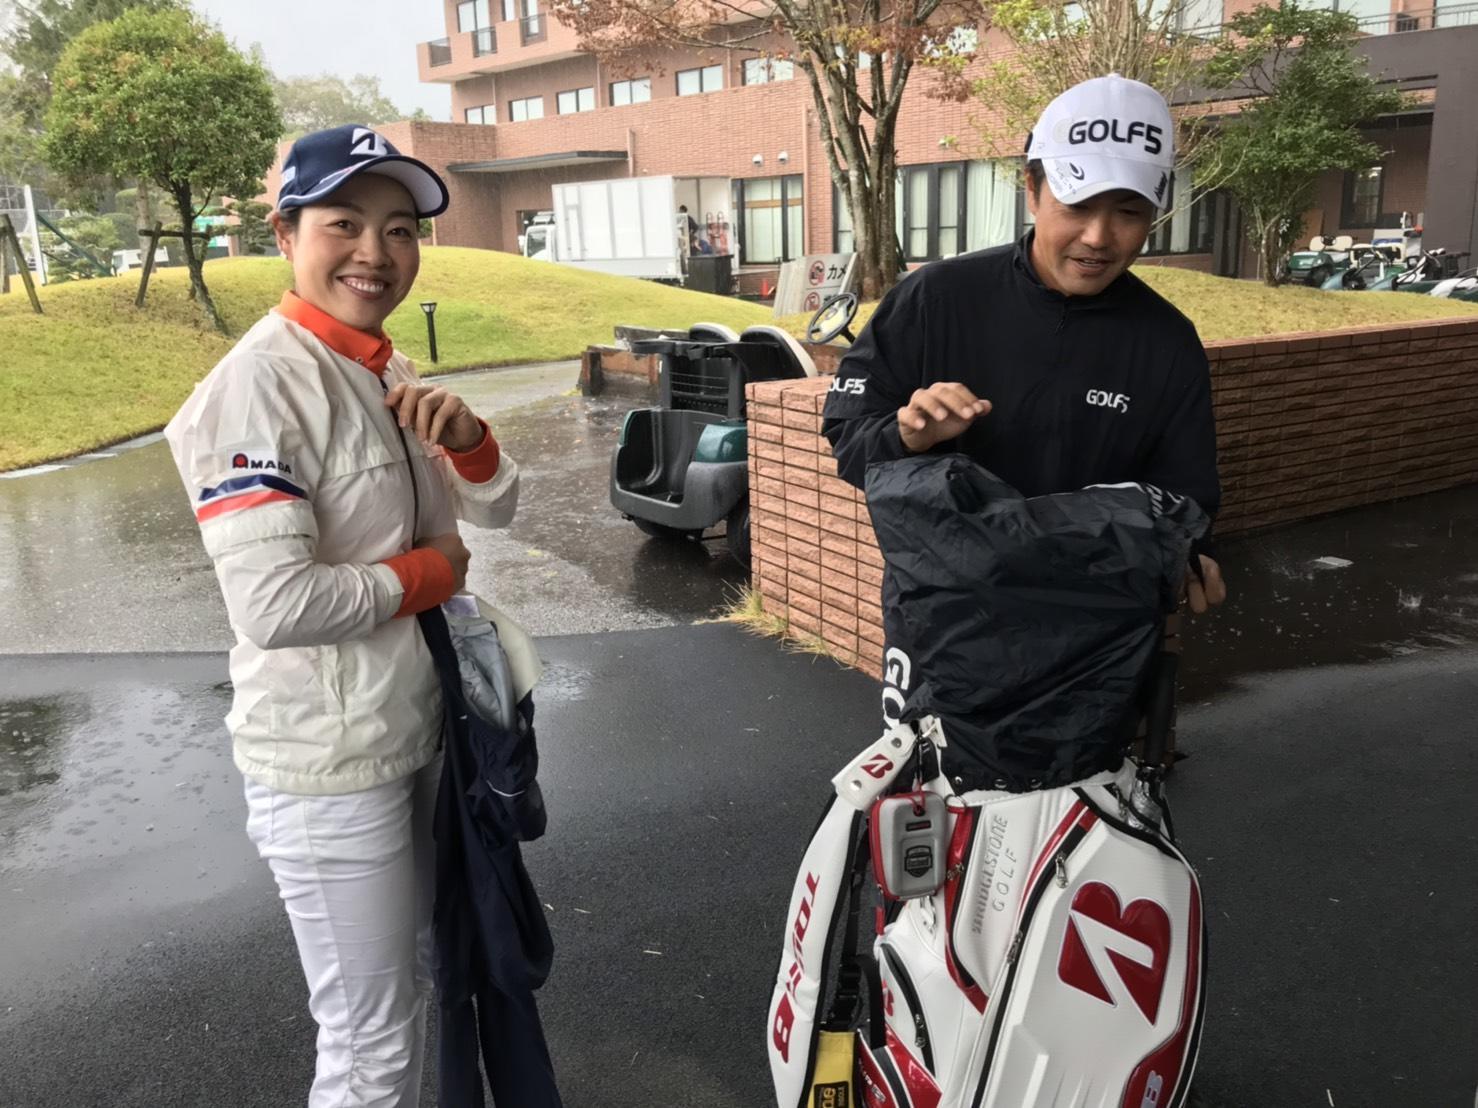 http://www.bs-golf.com/pro/d72a0b9ea3f609befd2705a63e8466df89b4f6c8.JPG